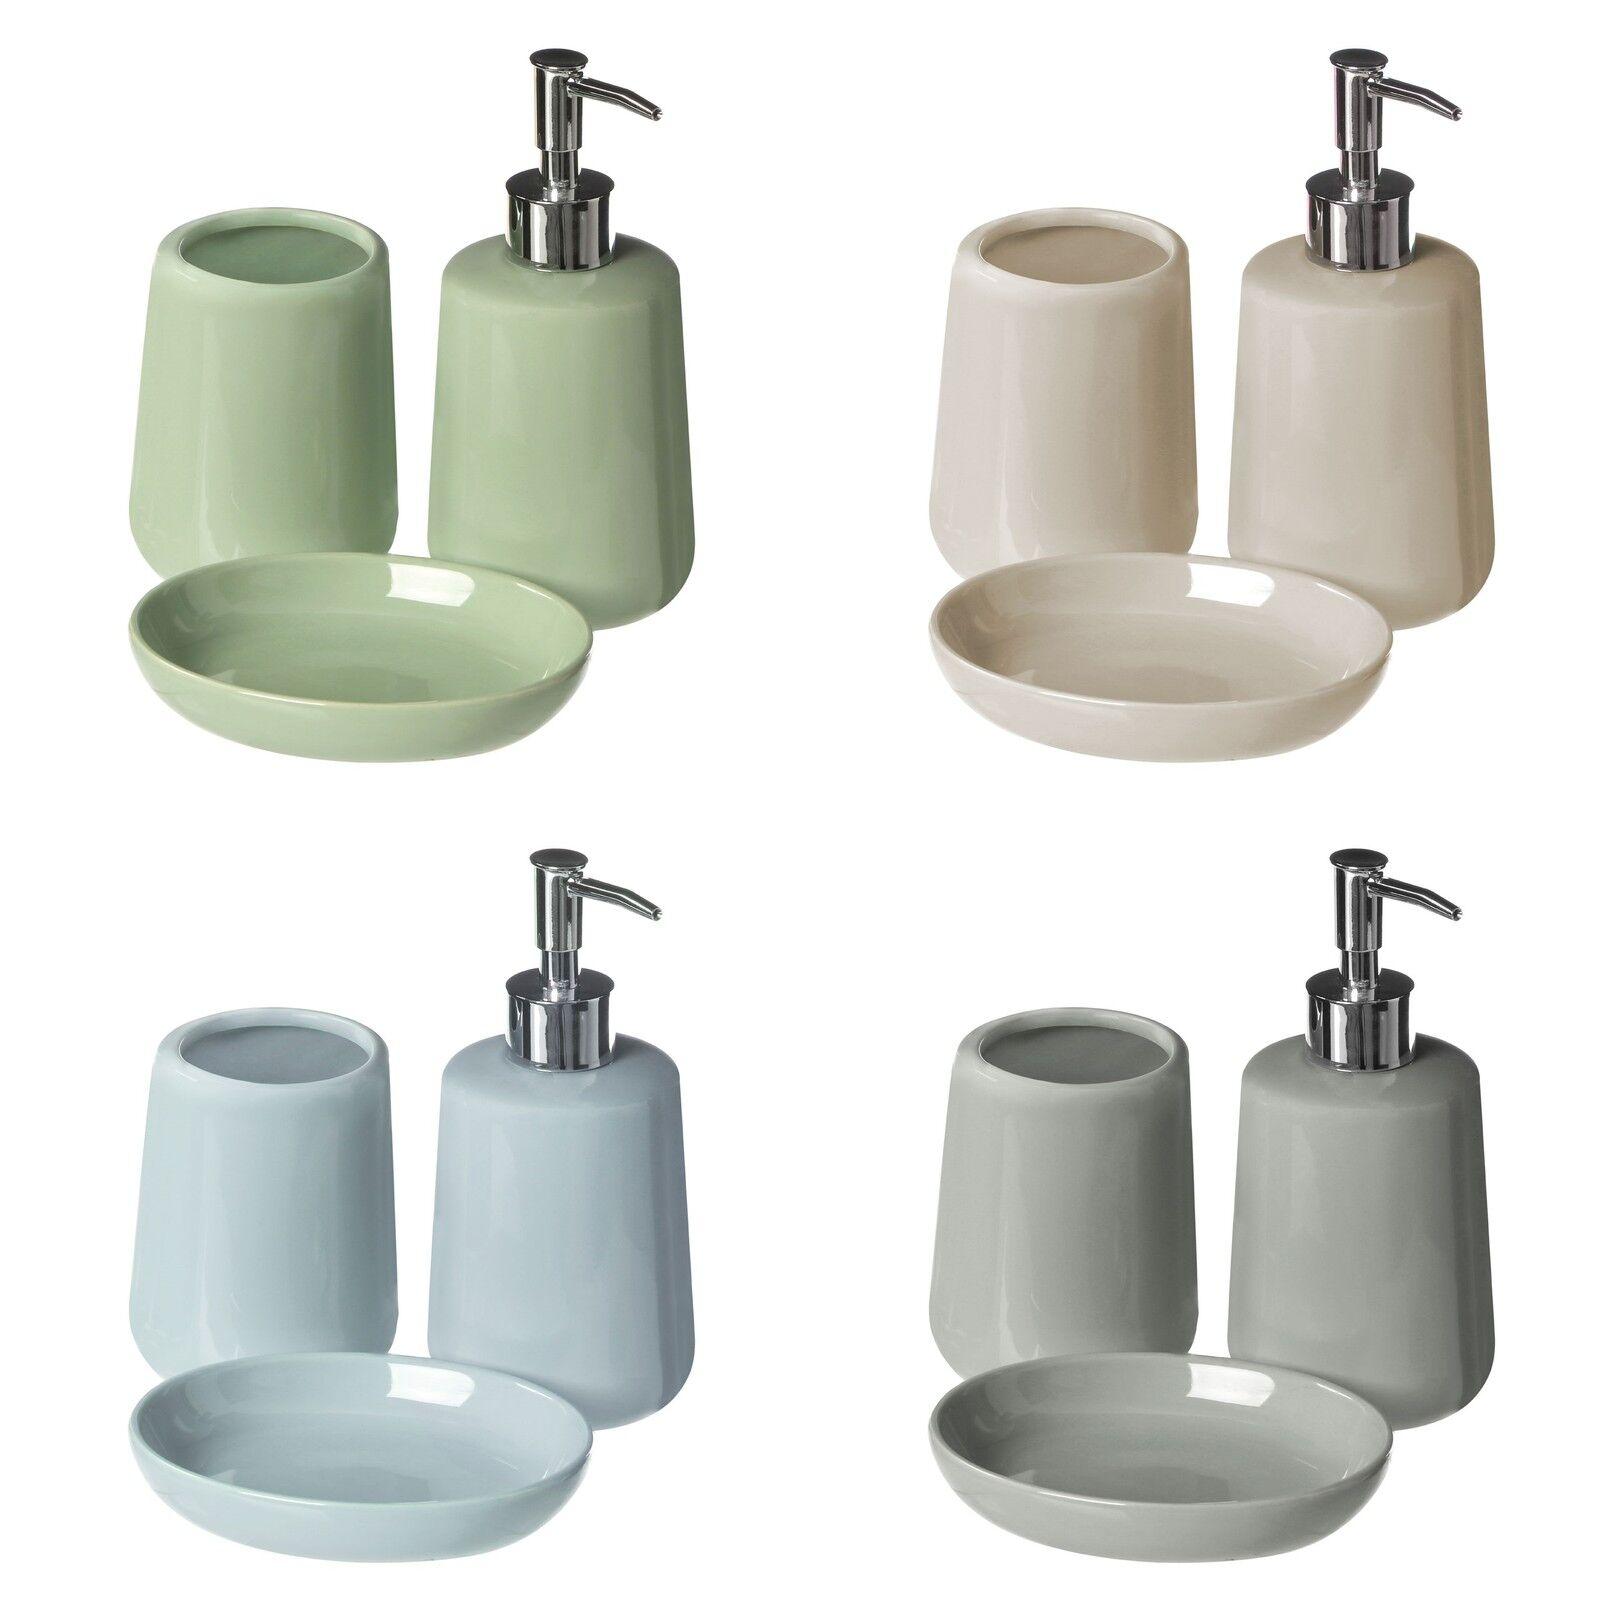 Moon 3pc Bathroom Set Ceramic For Home Office Bathroom Toilet ...